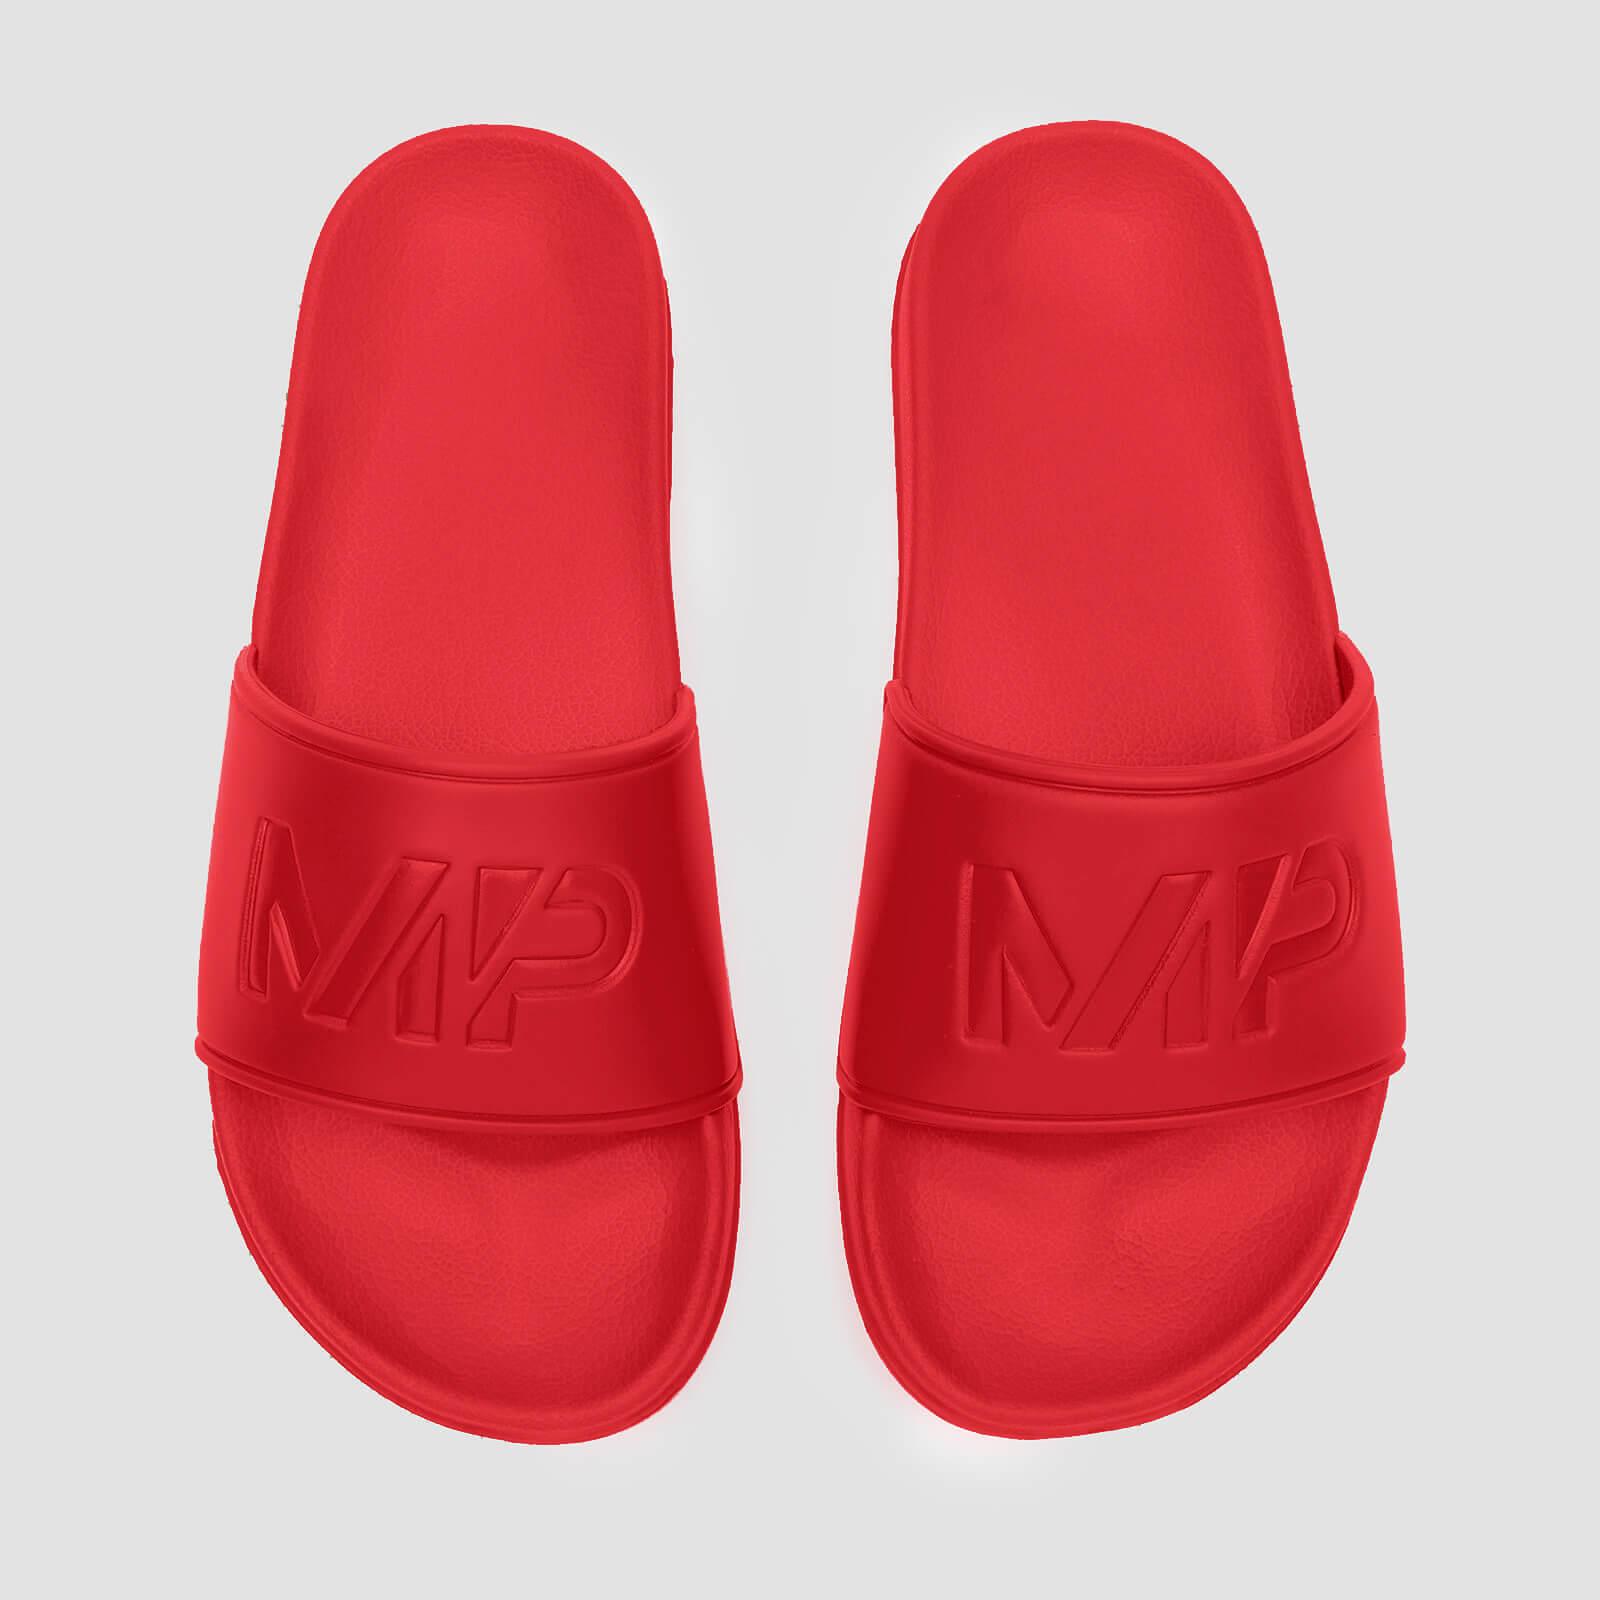 Купить MP Men's Sliders - Danger - UK 6, Myprotein International